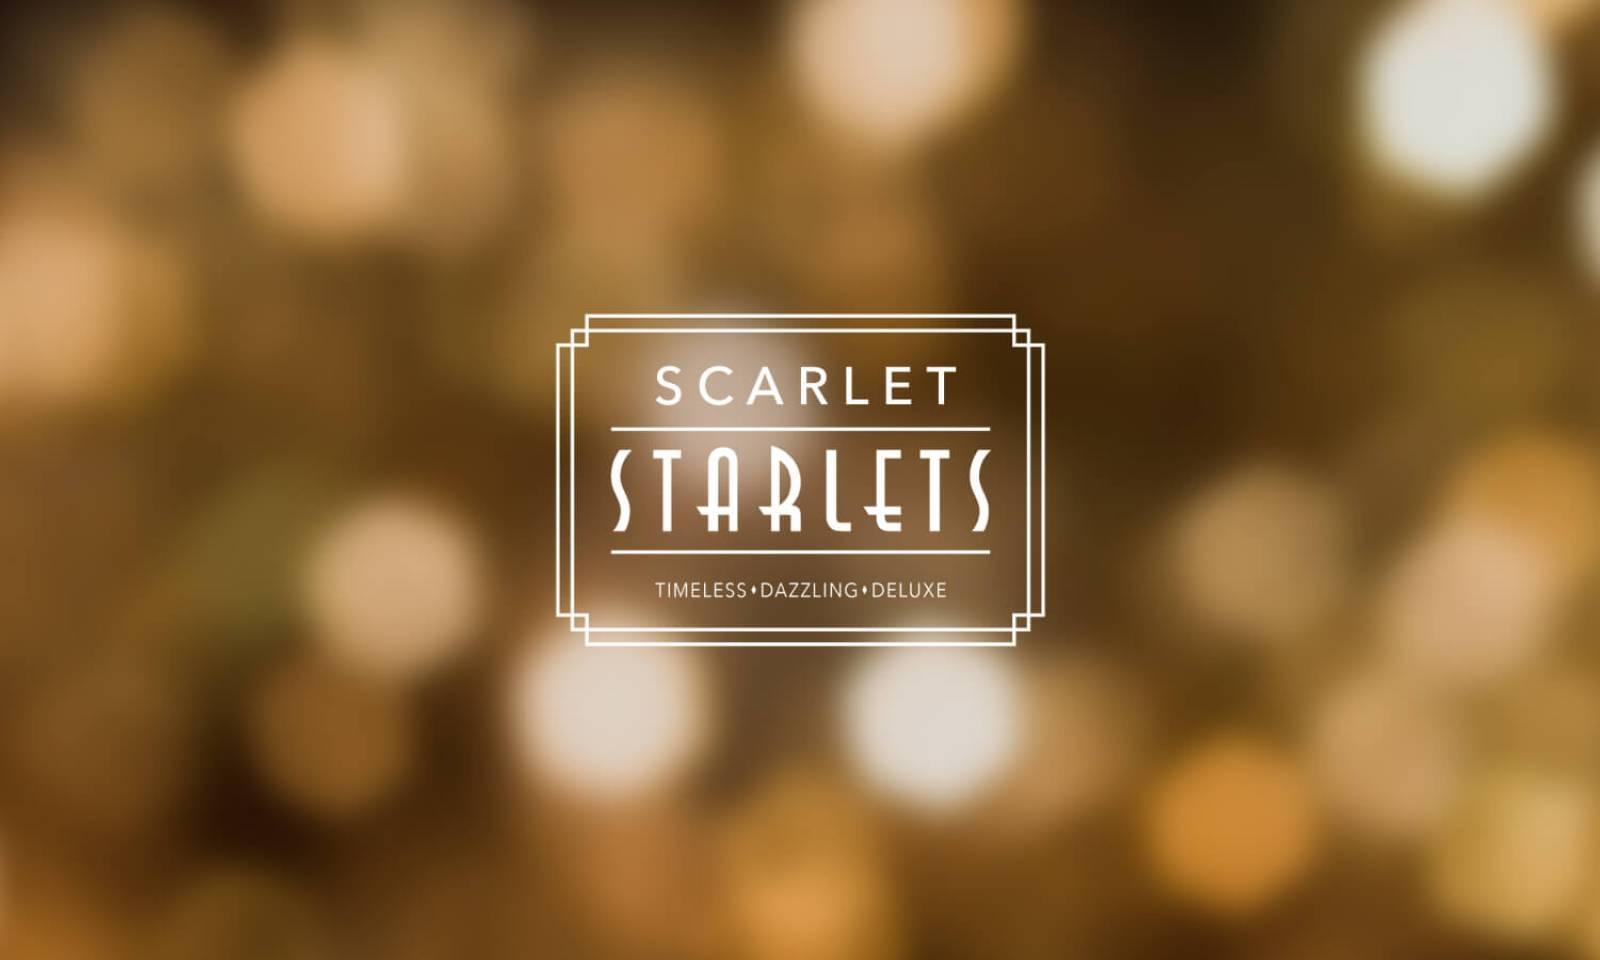 Scarlet-starlets-4-logo-corporate-identity-agency-graphic-design-canterbury.jpg